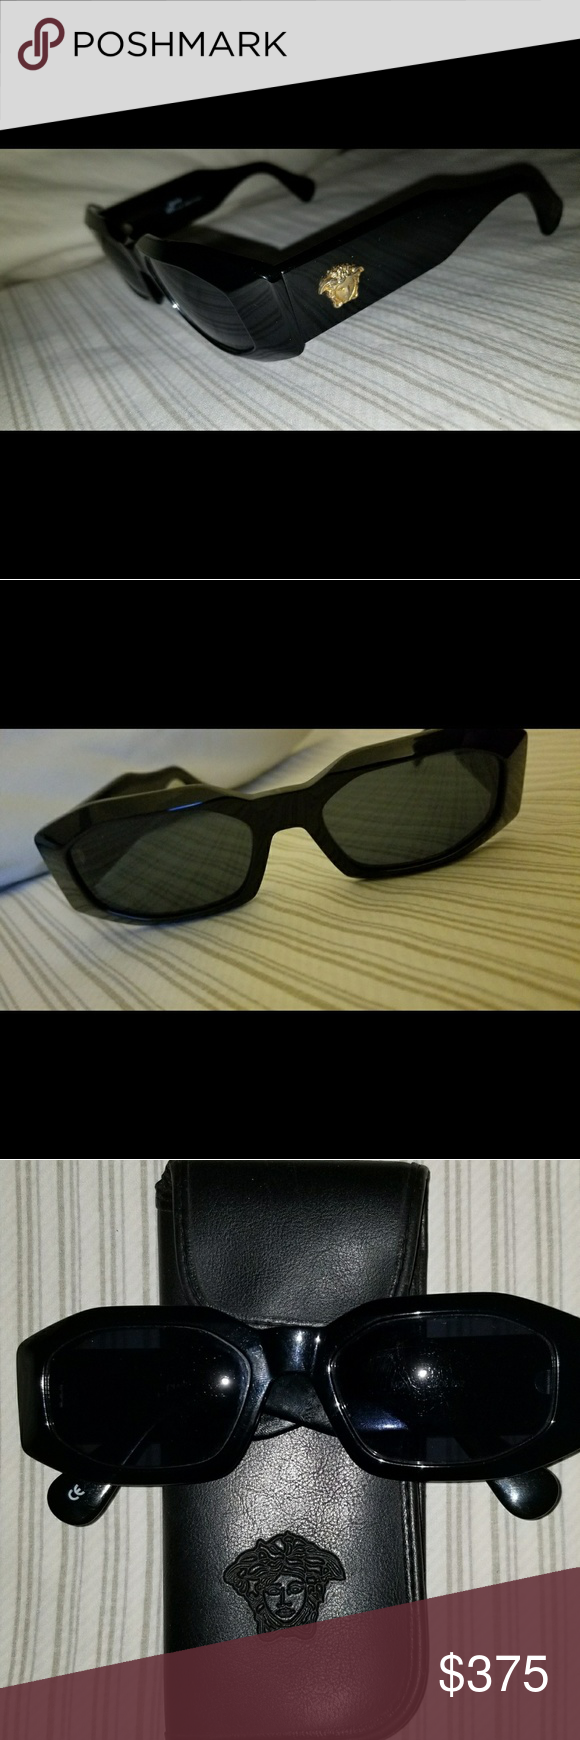 baa93946034c GIANNI Versace Vintage Sunglasses. GIANNI Versace Vintage Sunglasses.  Model: 414 Col.852